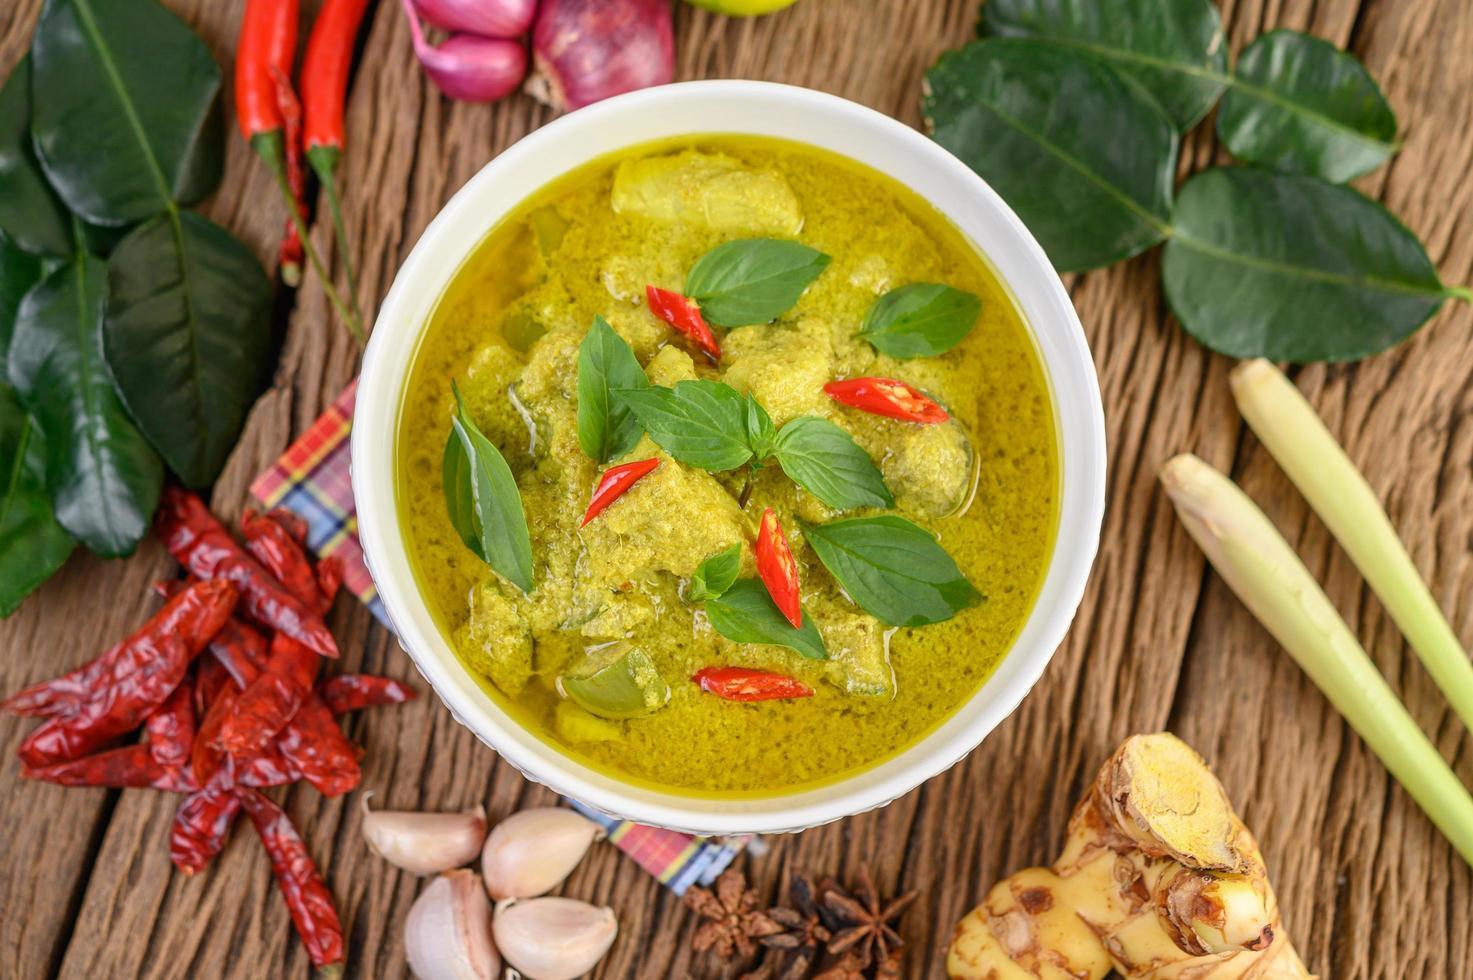 groene curry met limoenen, rode ui, citroengras, knoflook en kaffirblaadjes foto